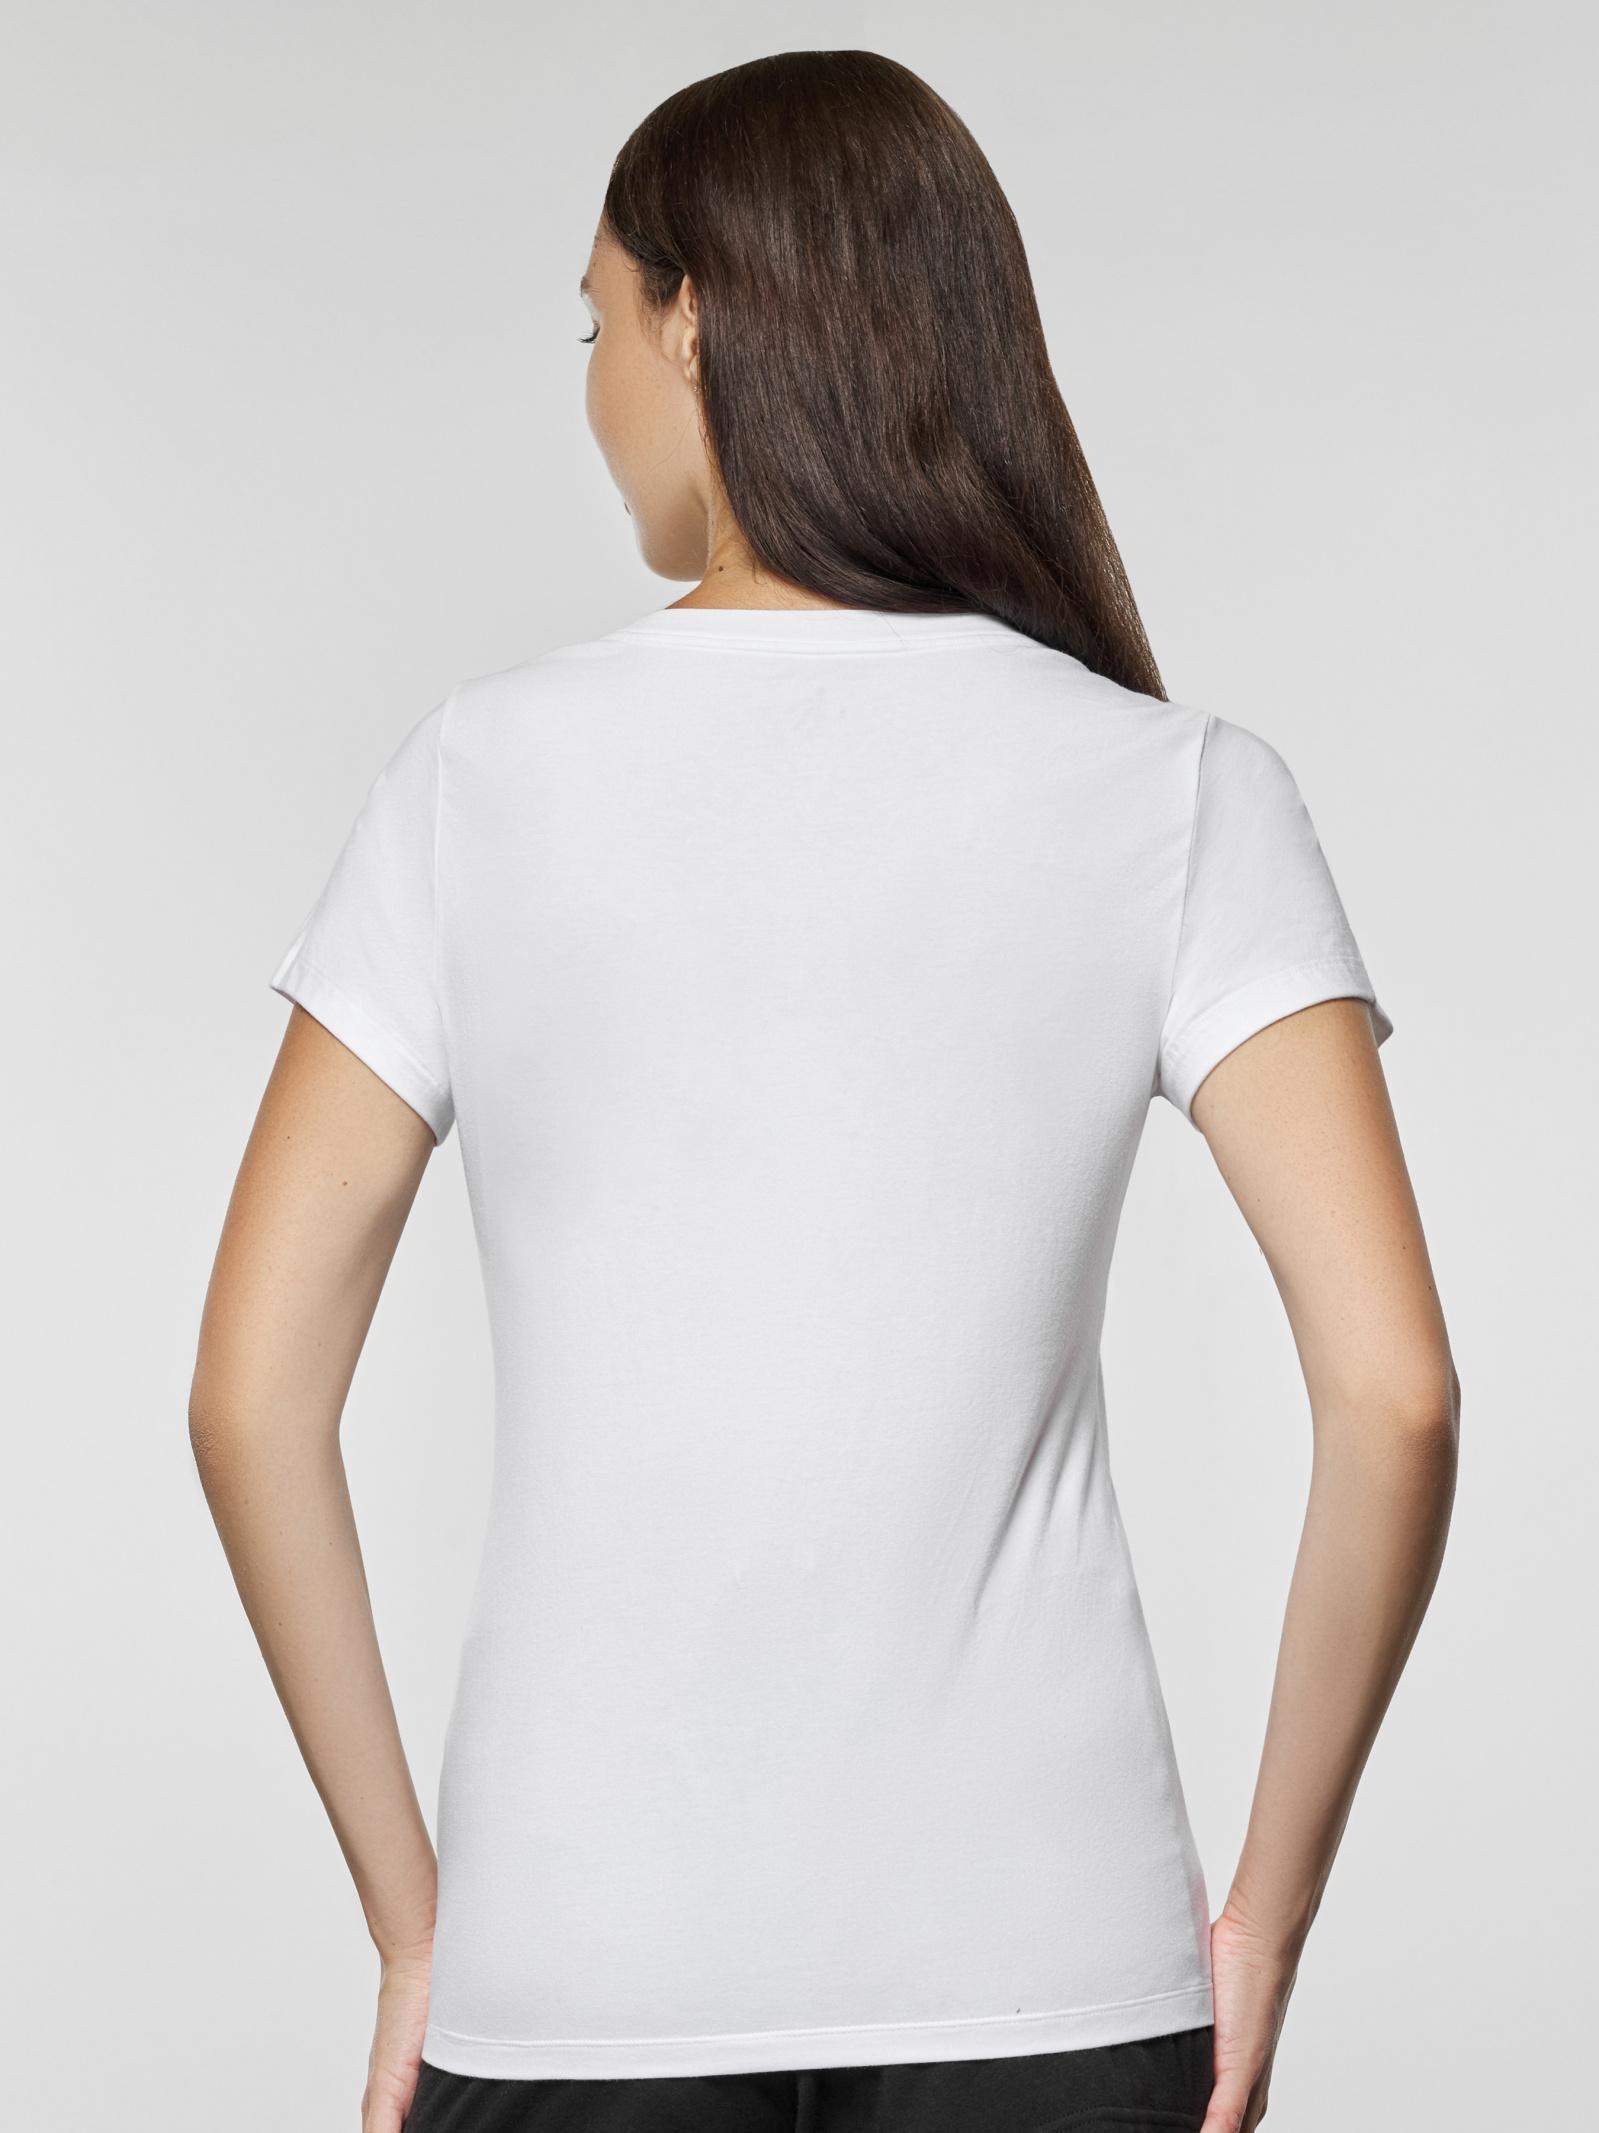 Calvin Klein Jeans Футболка жіночі модель QS6442E_100_0041 купити, 2017